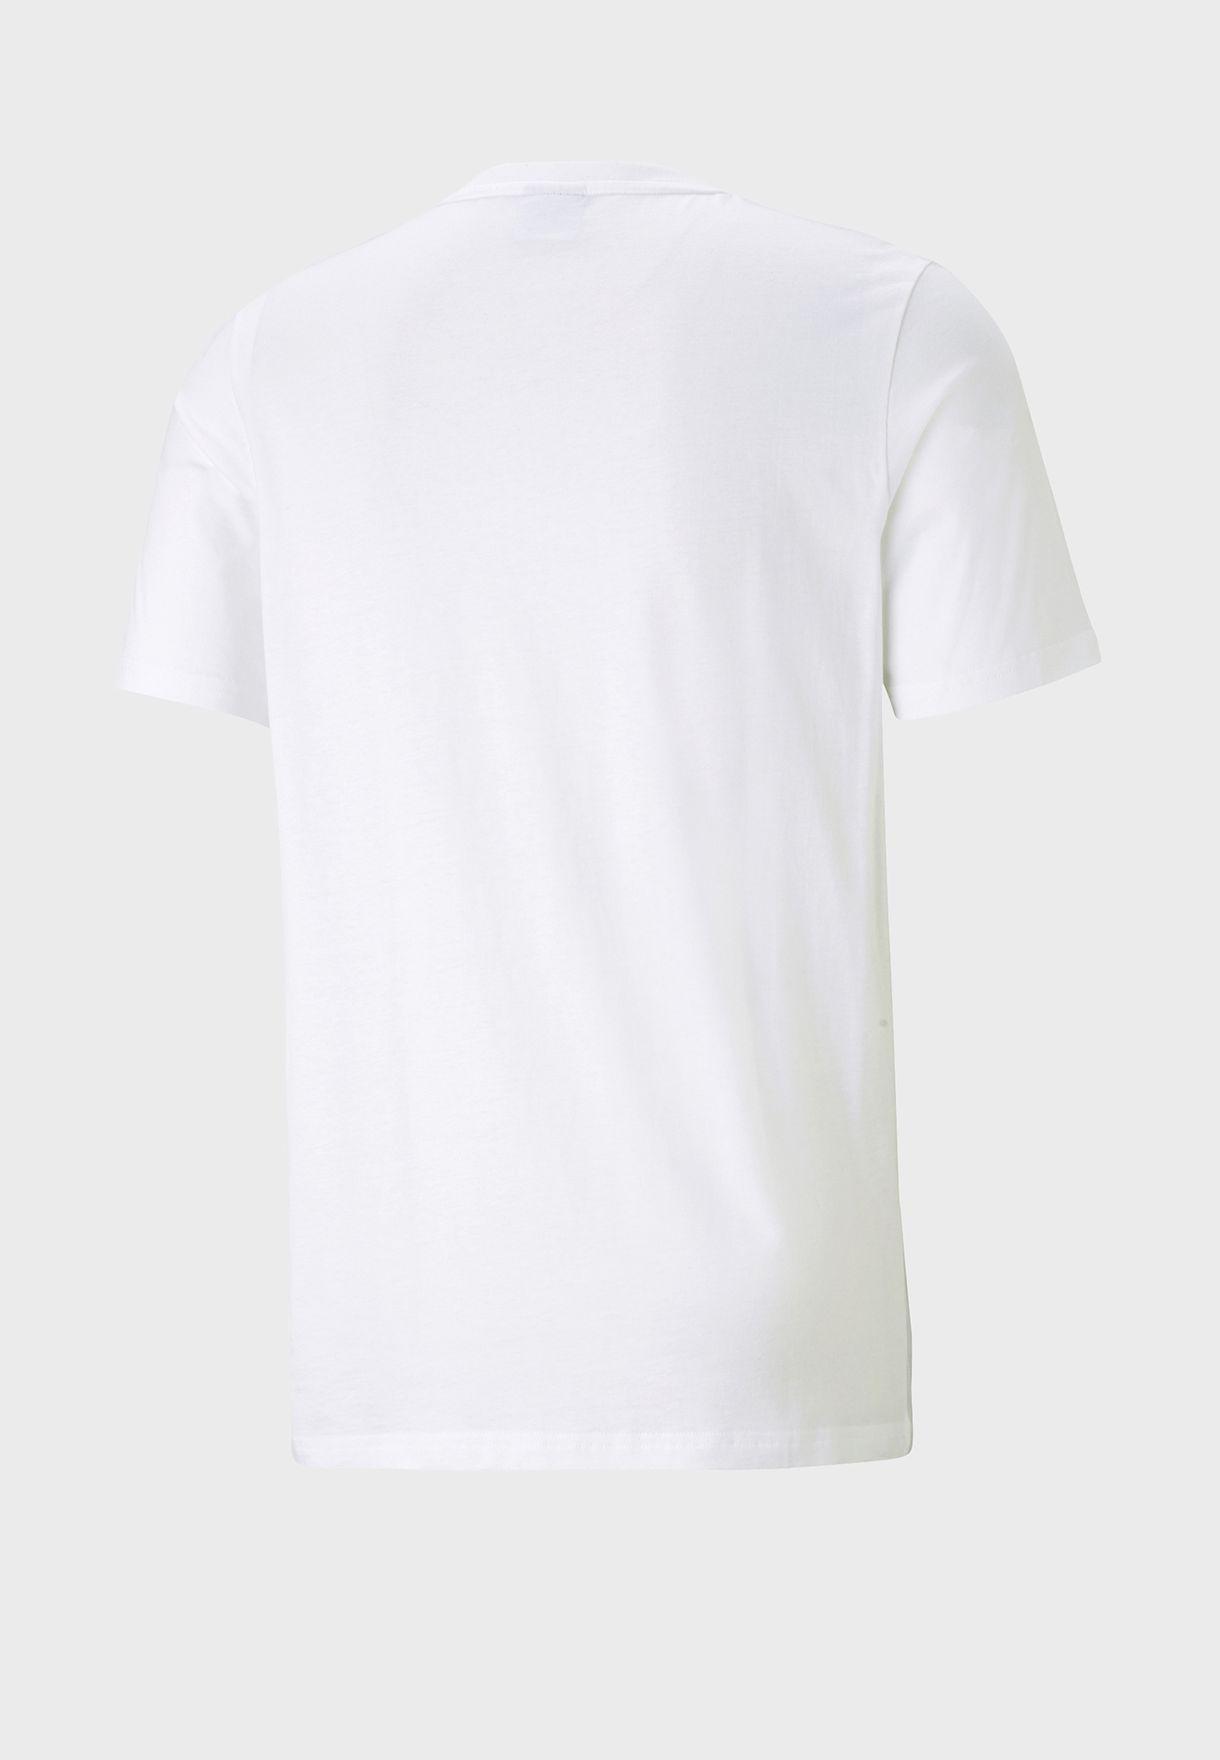 Graphic Key Moments T-Shirt